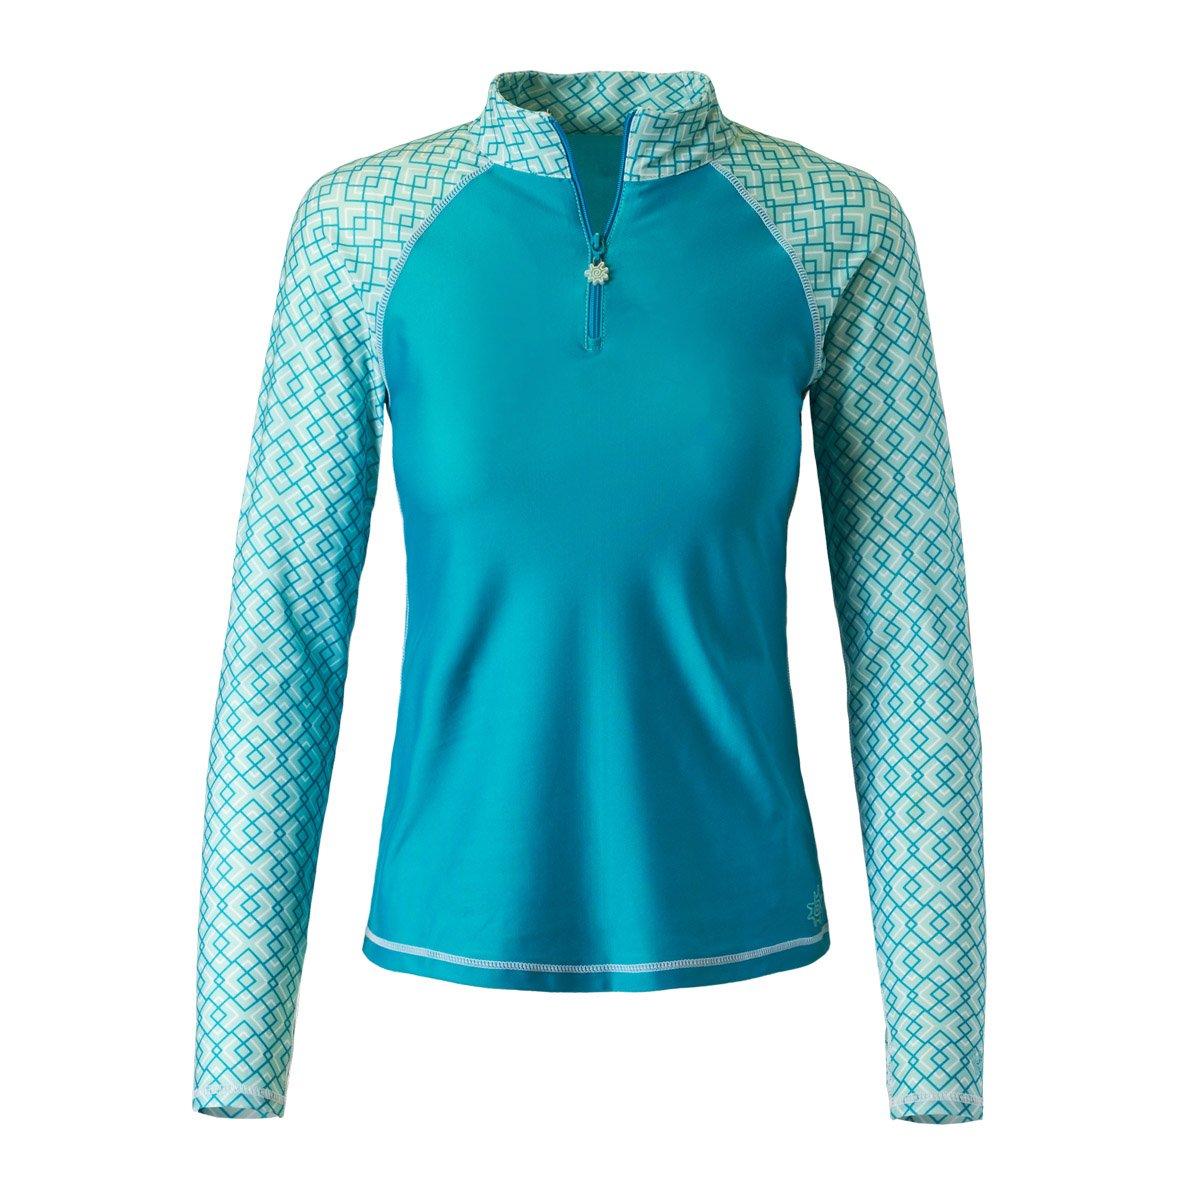 UV SKINZ UPF 50+ Womens Long Sleeve Quarter Zip Sun & Swim Shirt (XL, Teal/Beach Glass Geo)